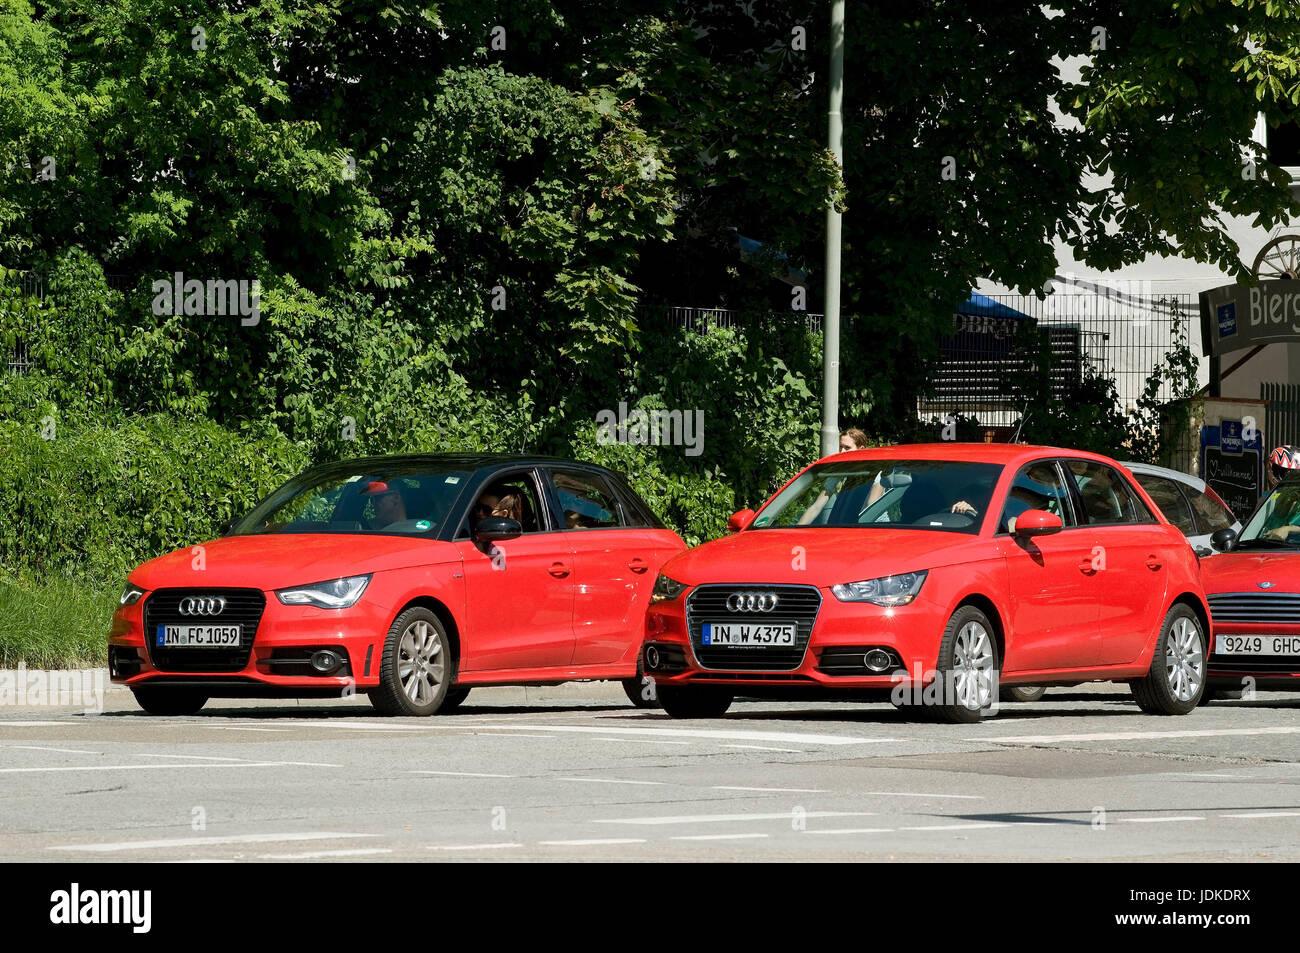 Europe, Germany, Bavaria, Ingolstadt, two red Audi models, , Europa, Deutschland, Bayern,  zwei rote Audi-Modelle - Stock Image